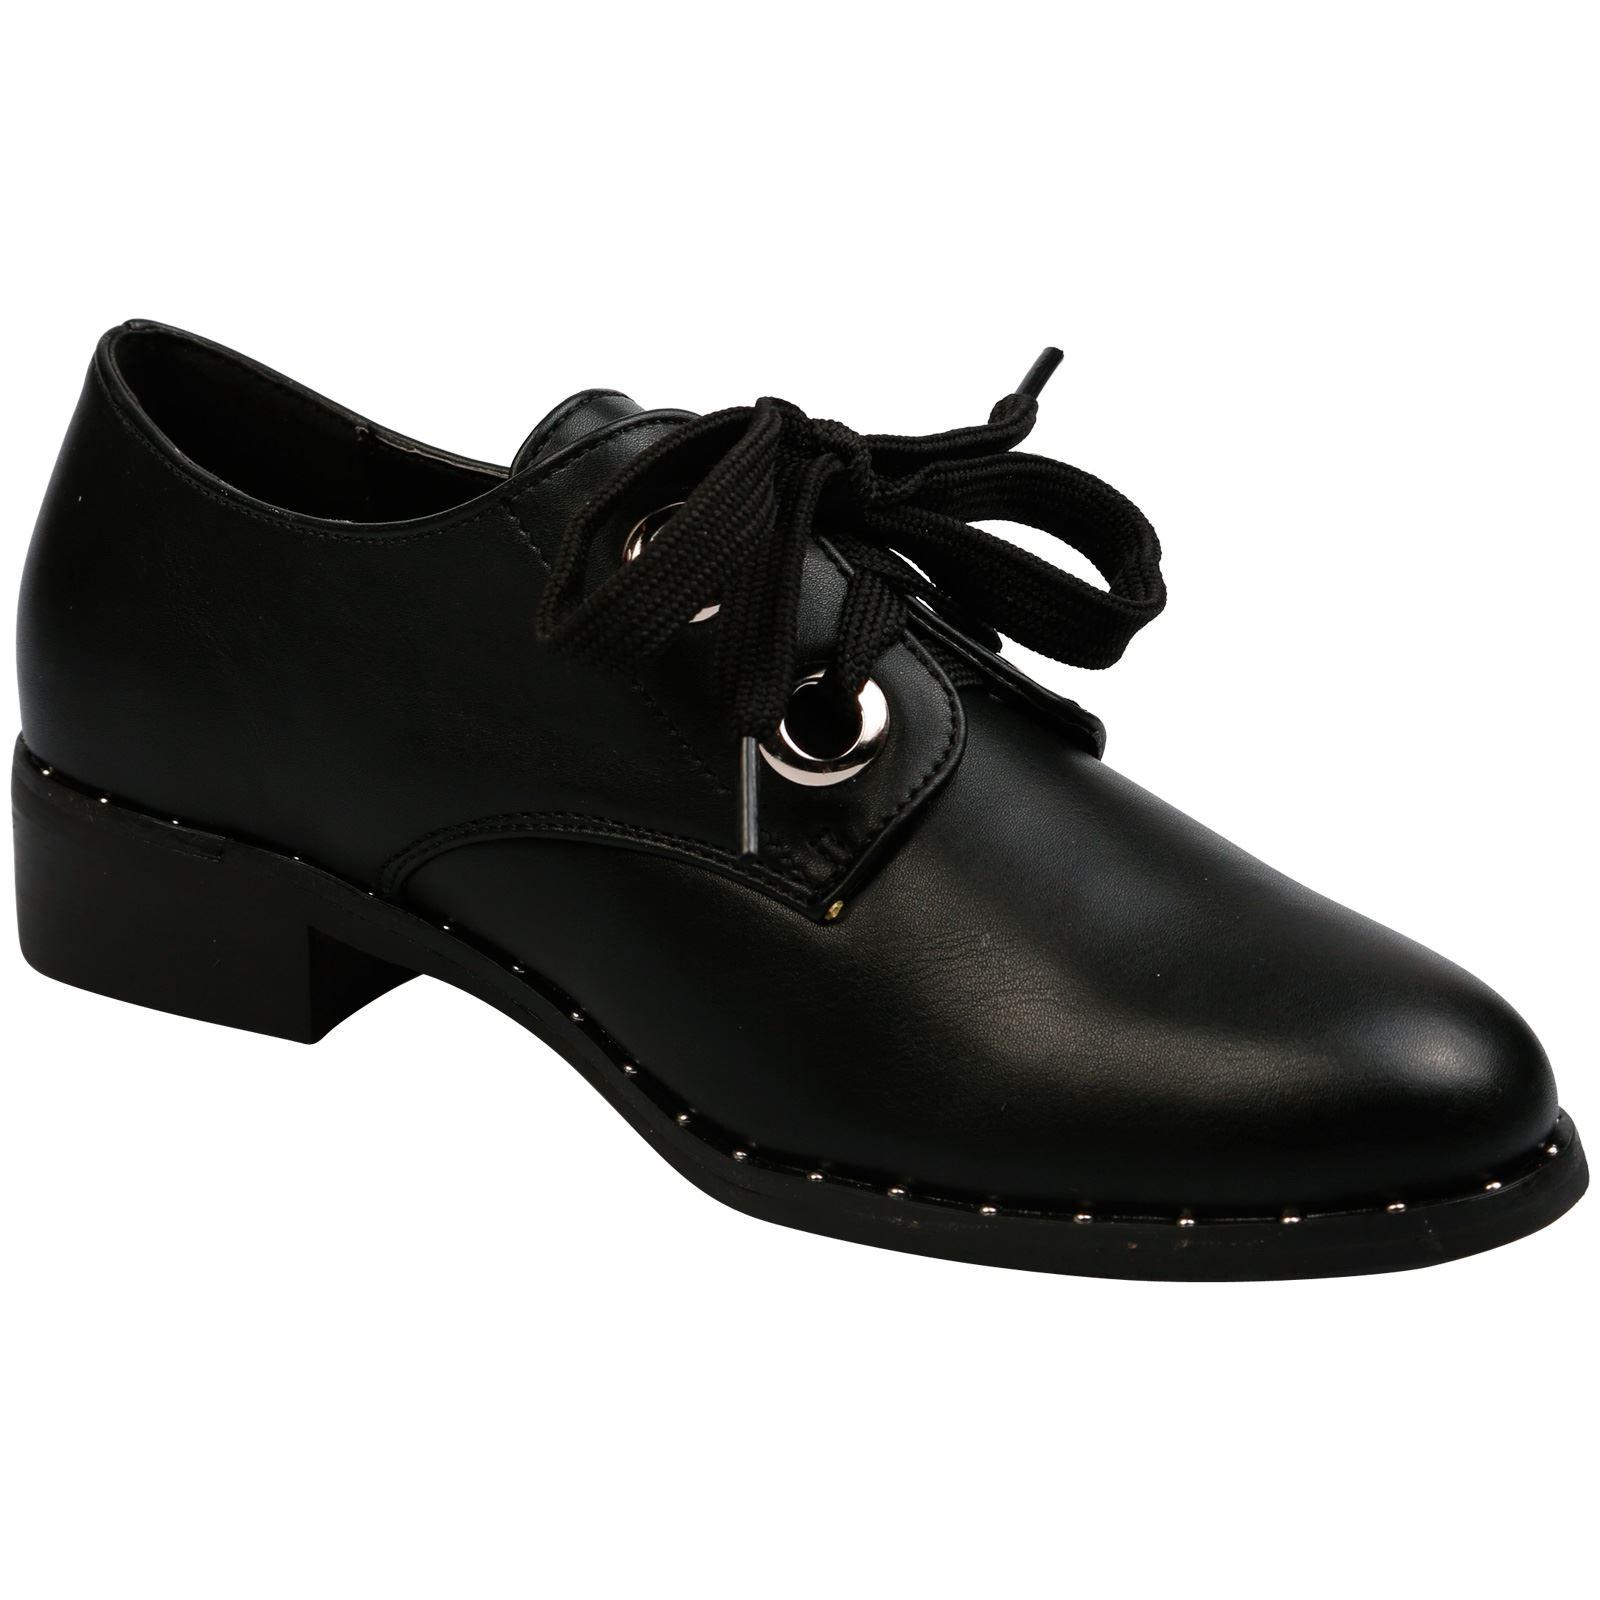 Levato Lace up Ladies Brogue Shoe UK 7 EU 40 osHivthzII